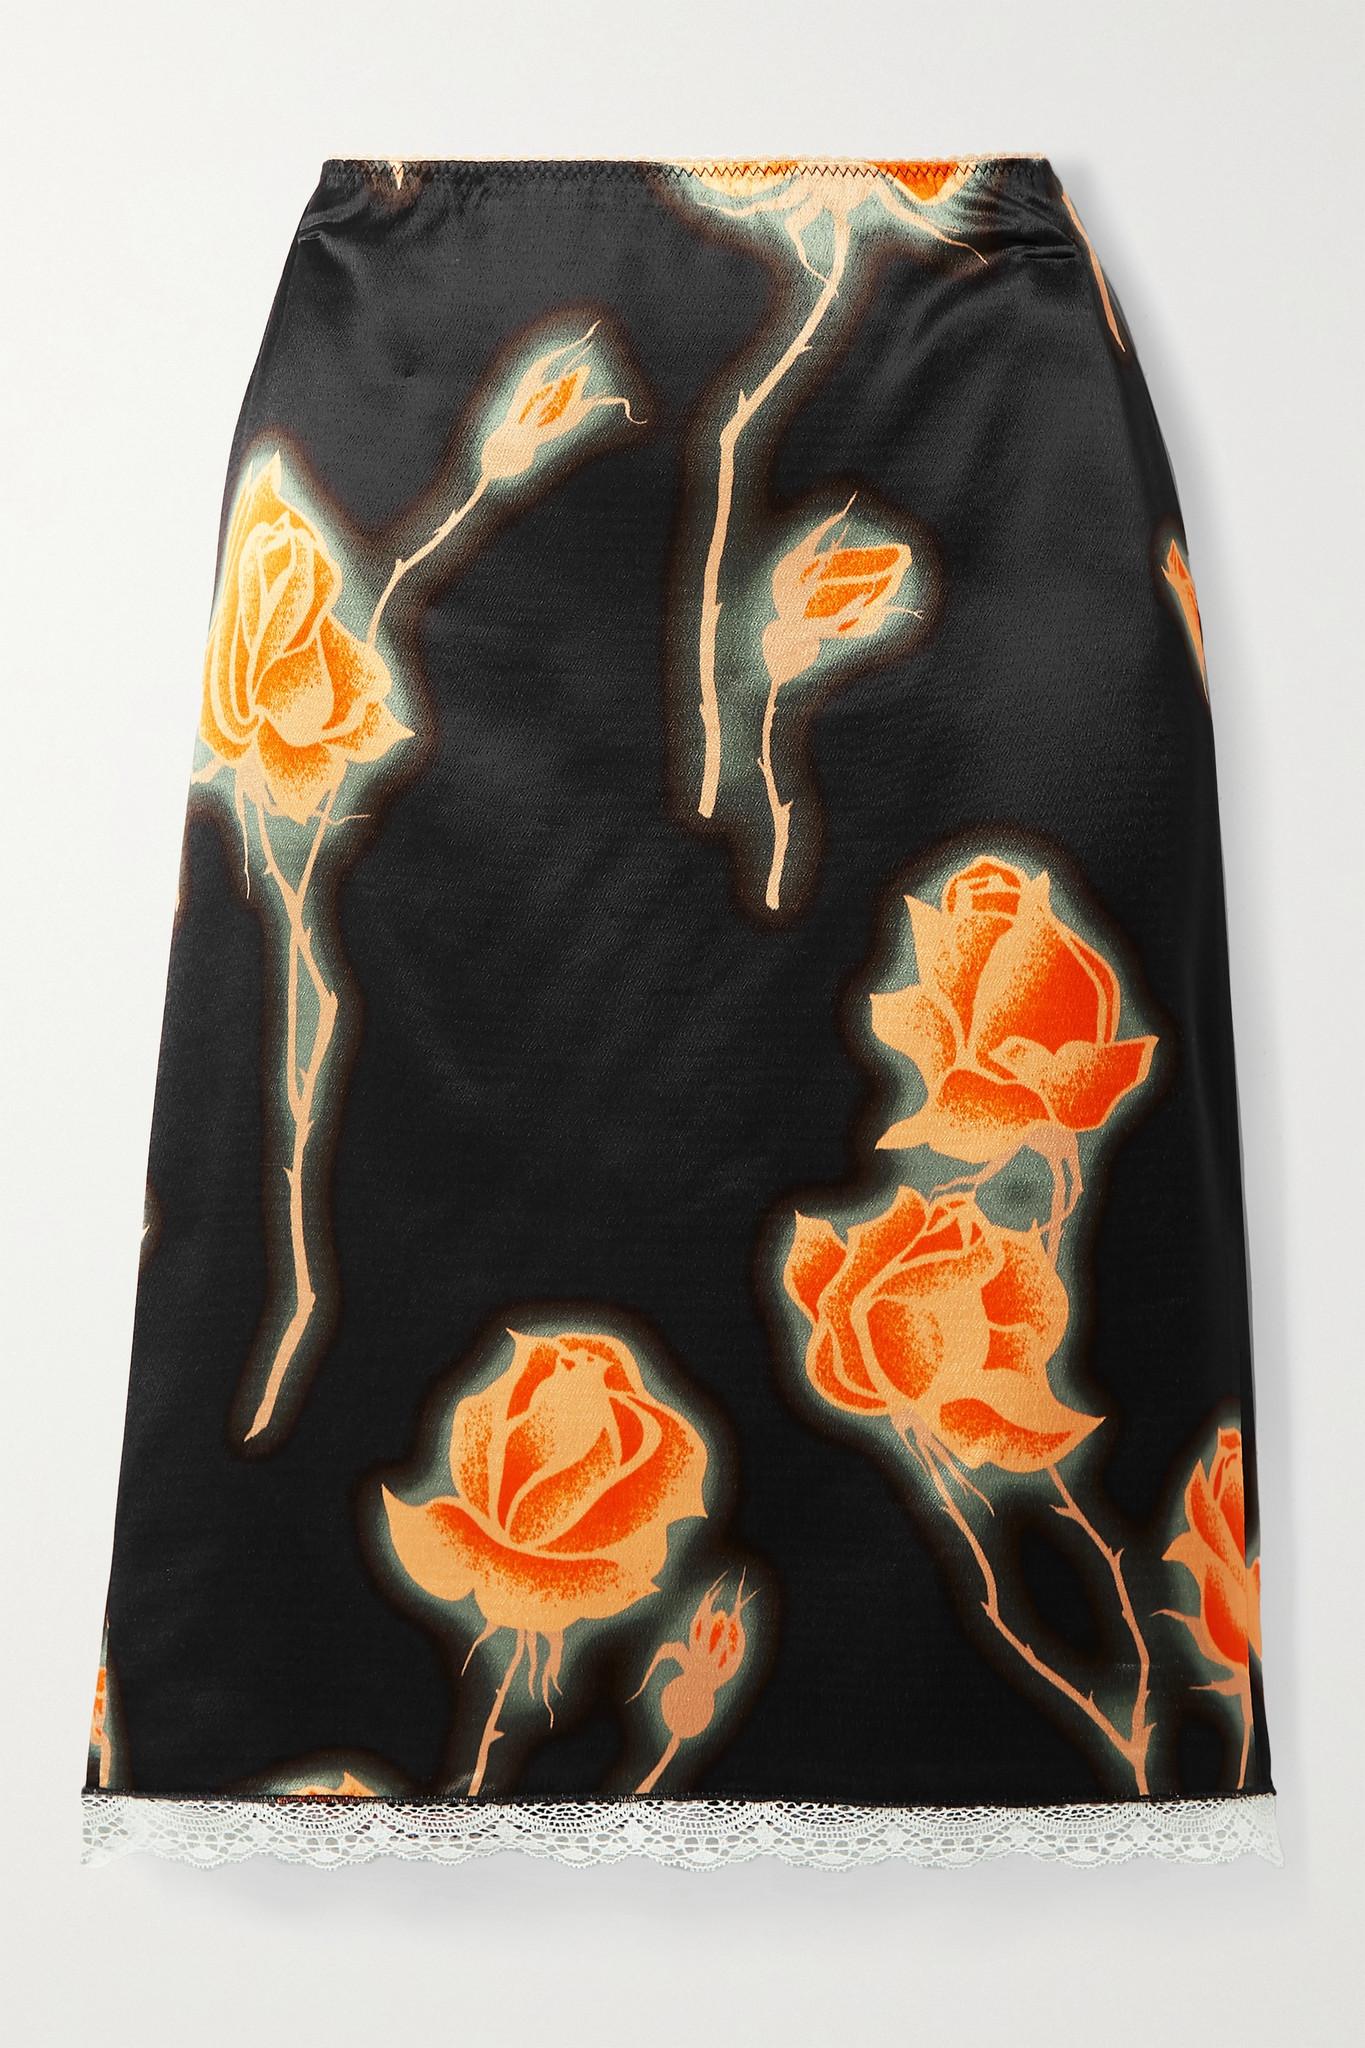 Meryll Rogge - 蕾丝边饰花卉印花缎布半身裙 - 黑色 - FR40